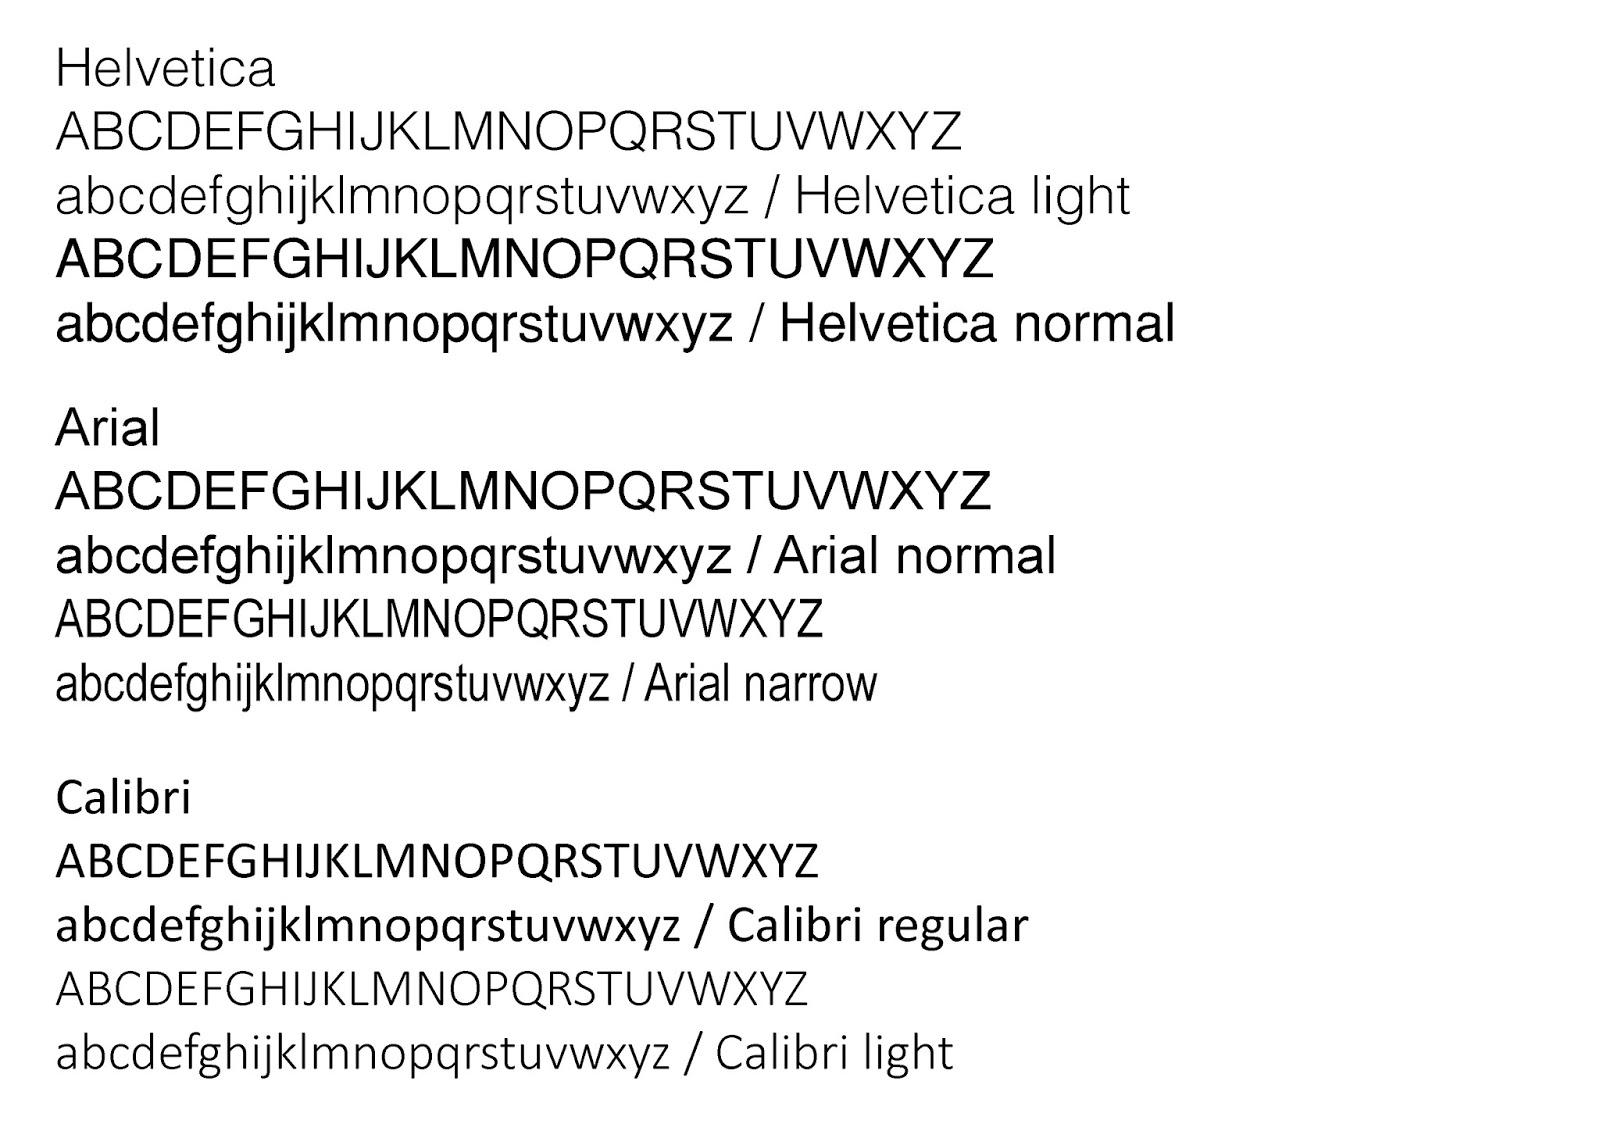 Charlie Hamnett Graphic Design Year 2: Project Typography